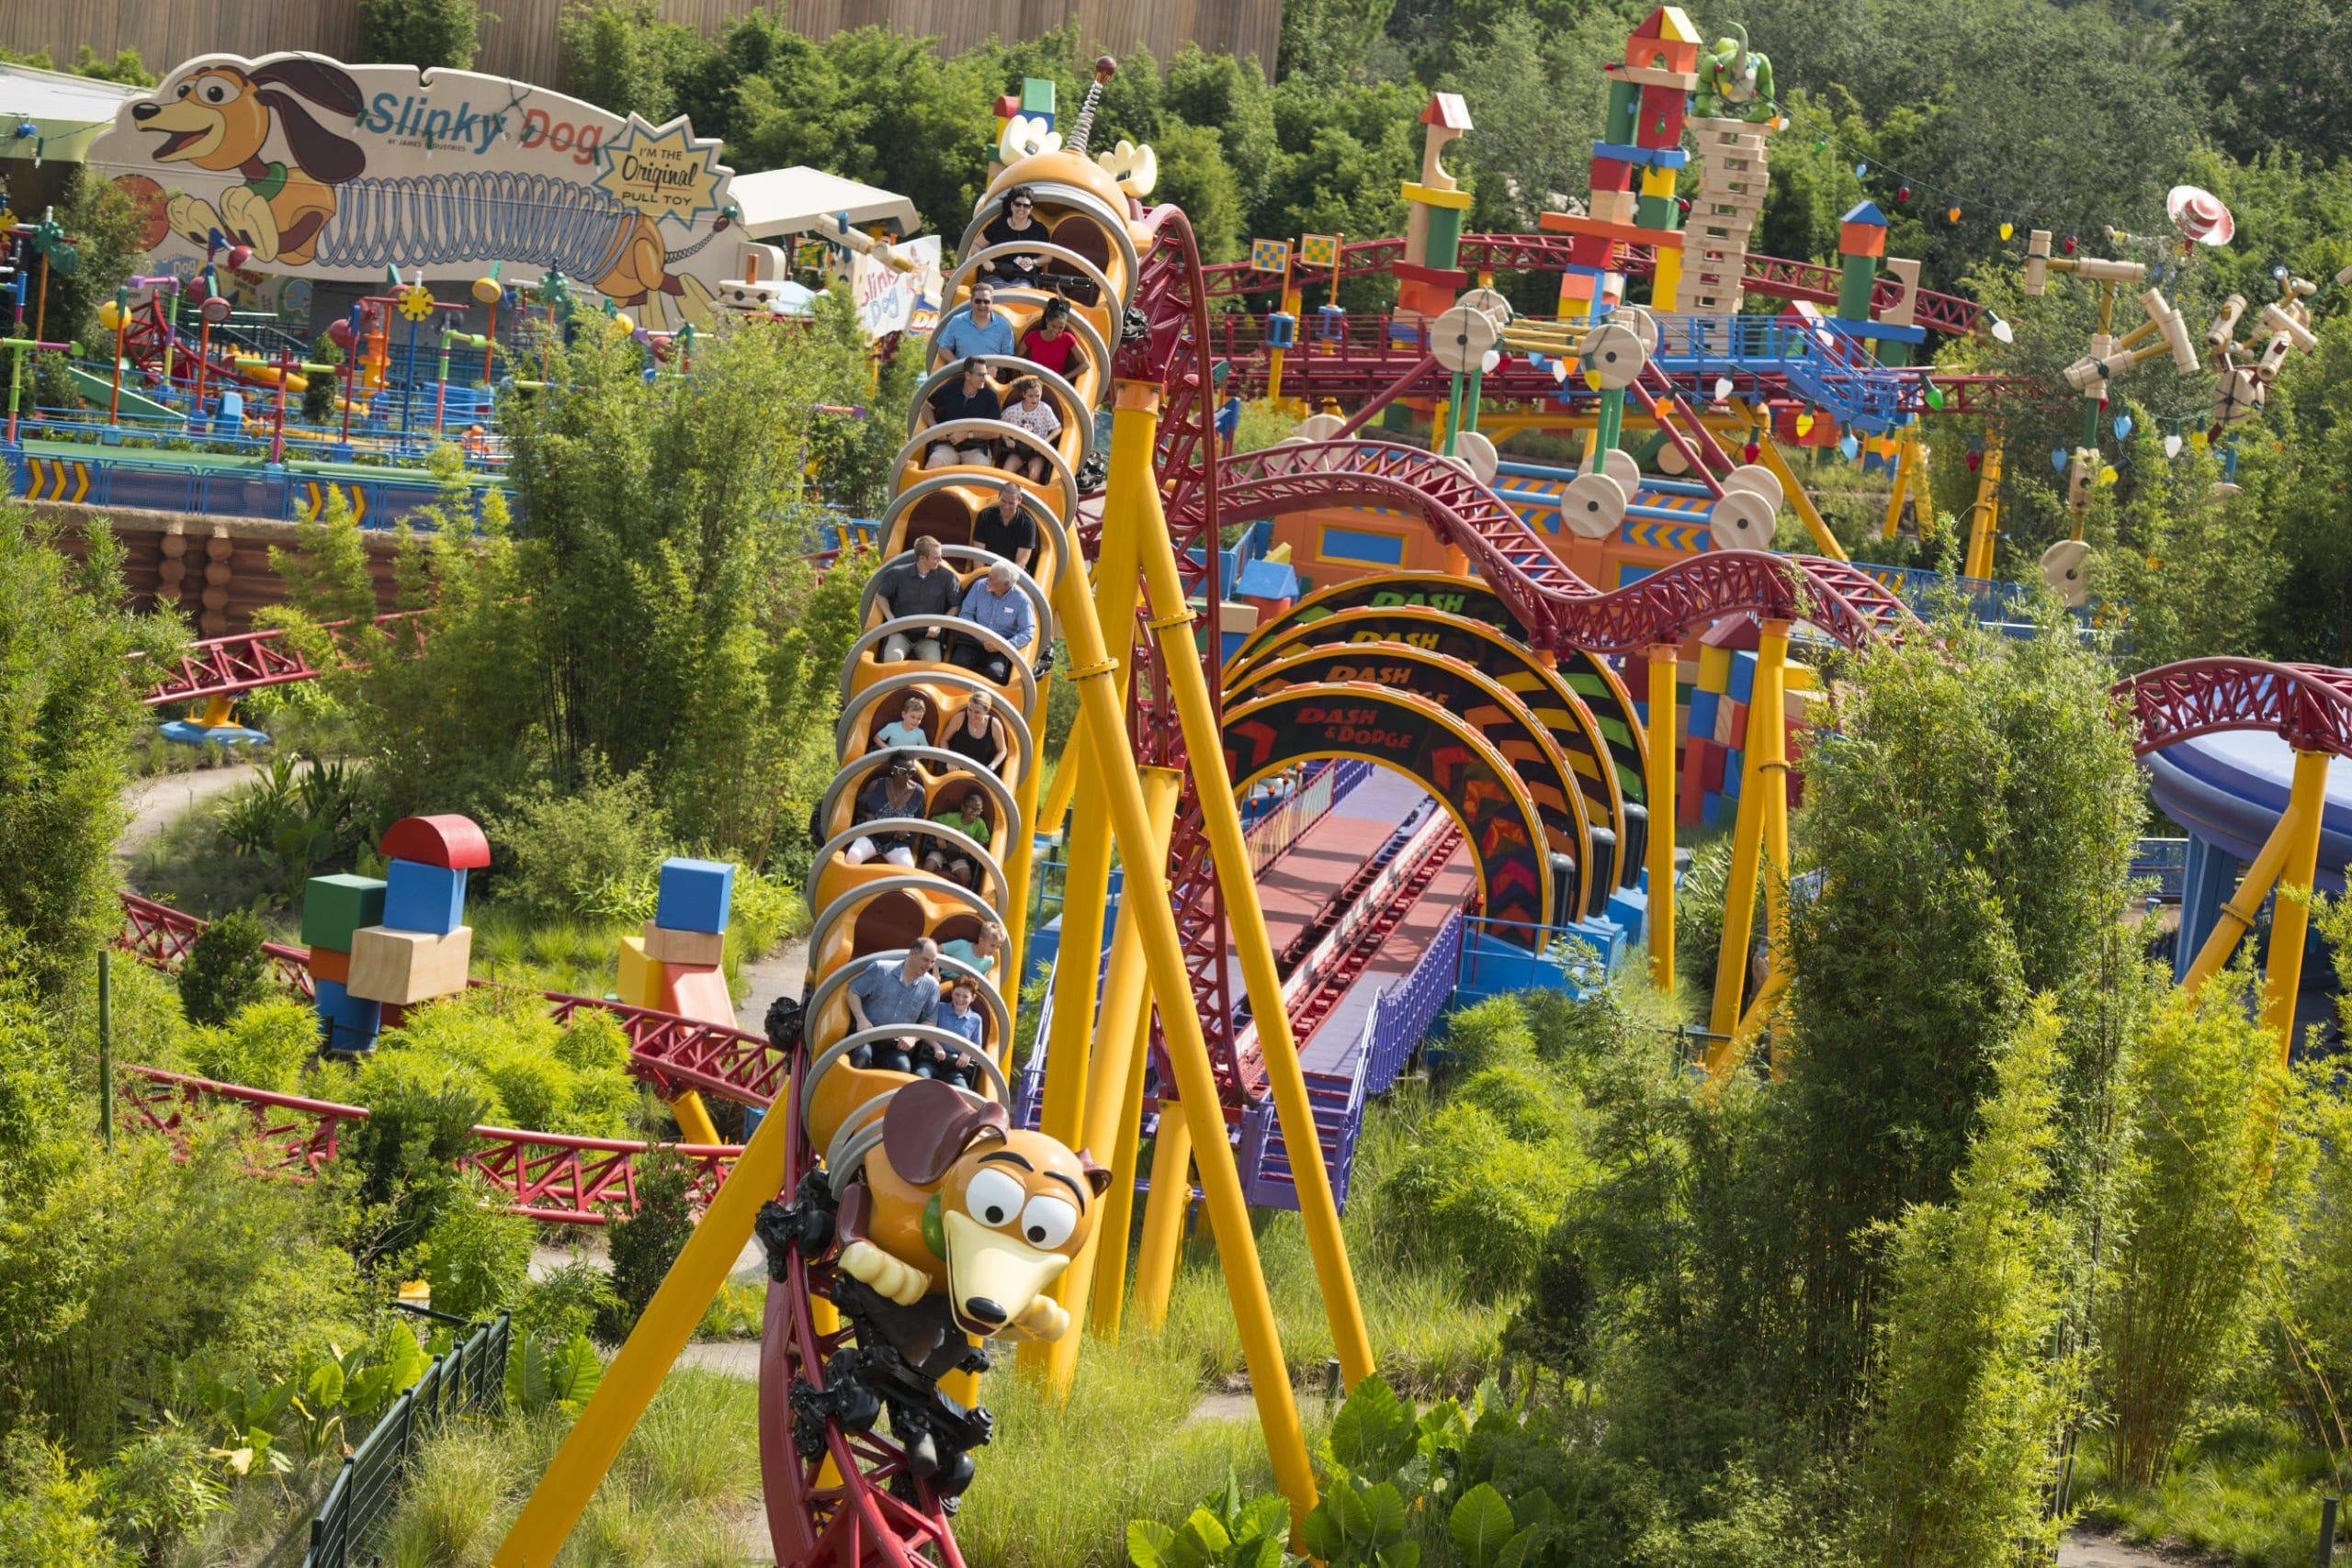 Riders enjoy the mild Slinky Dog Dash coaster in Toy Story Land.